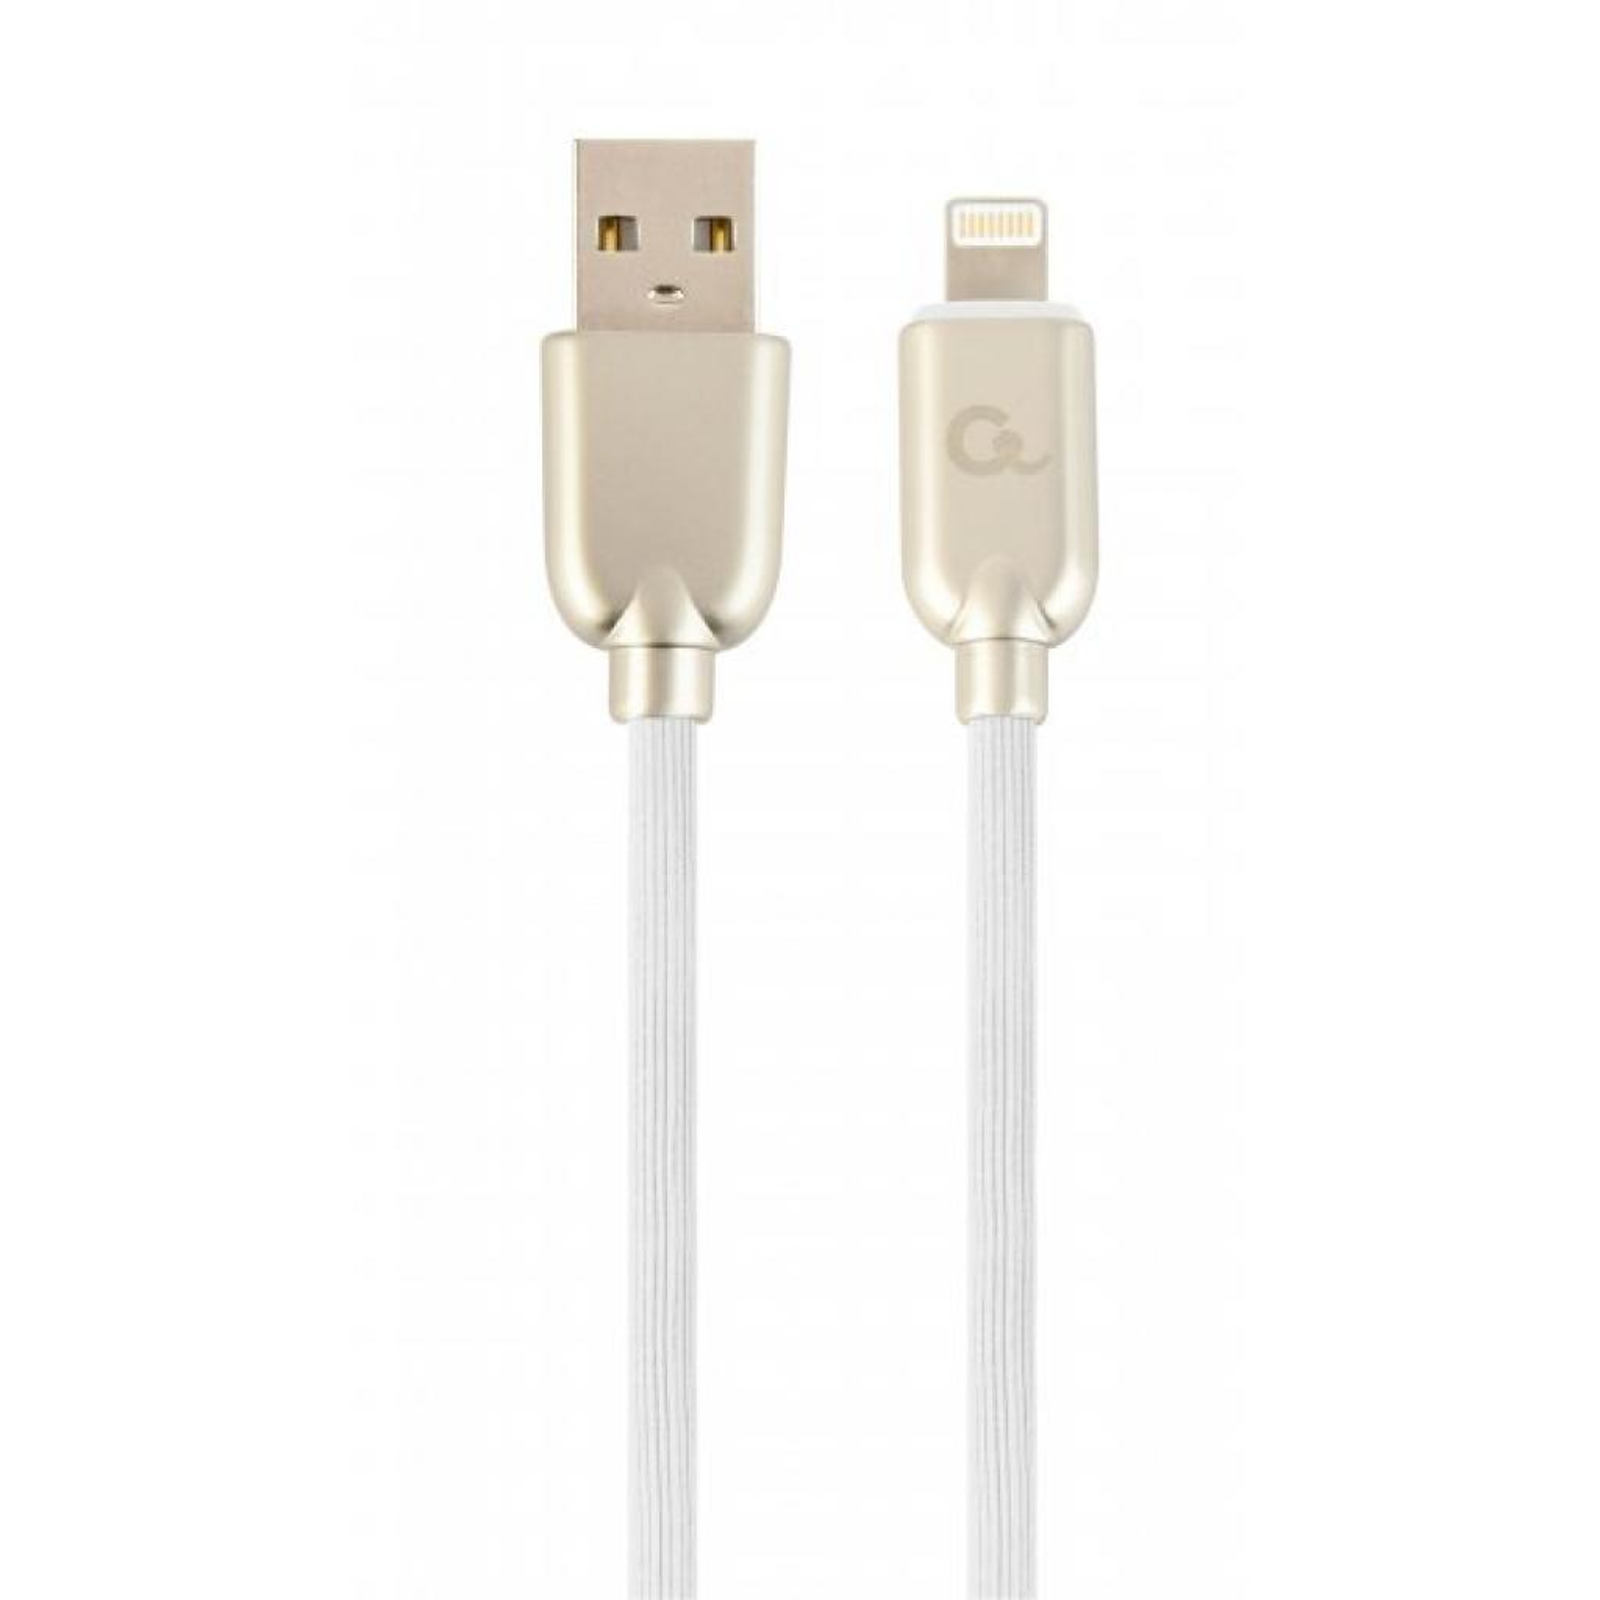 Дата кабель USB 2.0 AM to Lightning 1.0m Cablexpert (CC-USB2R-AMLM-1M)